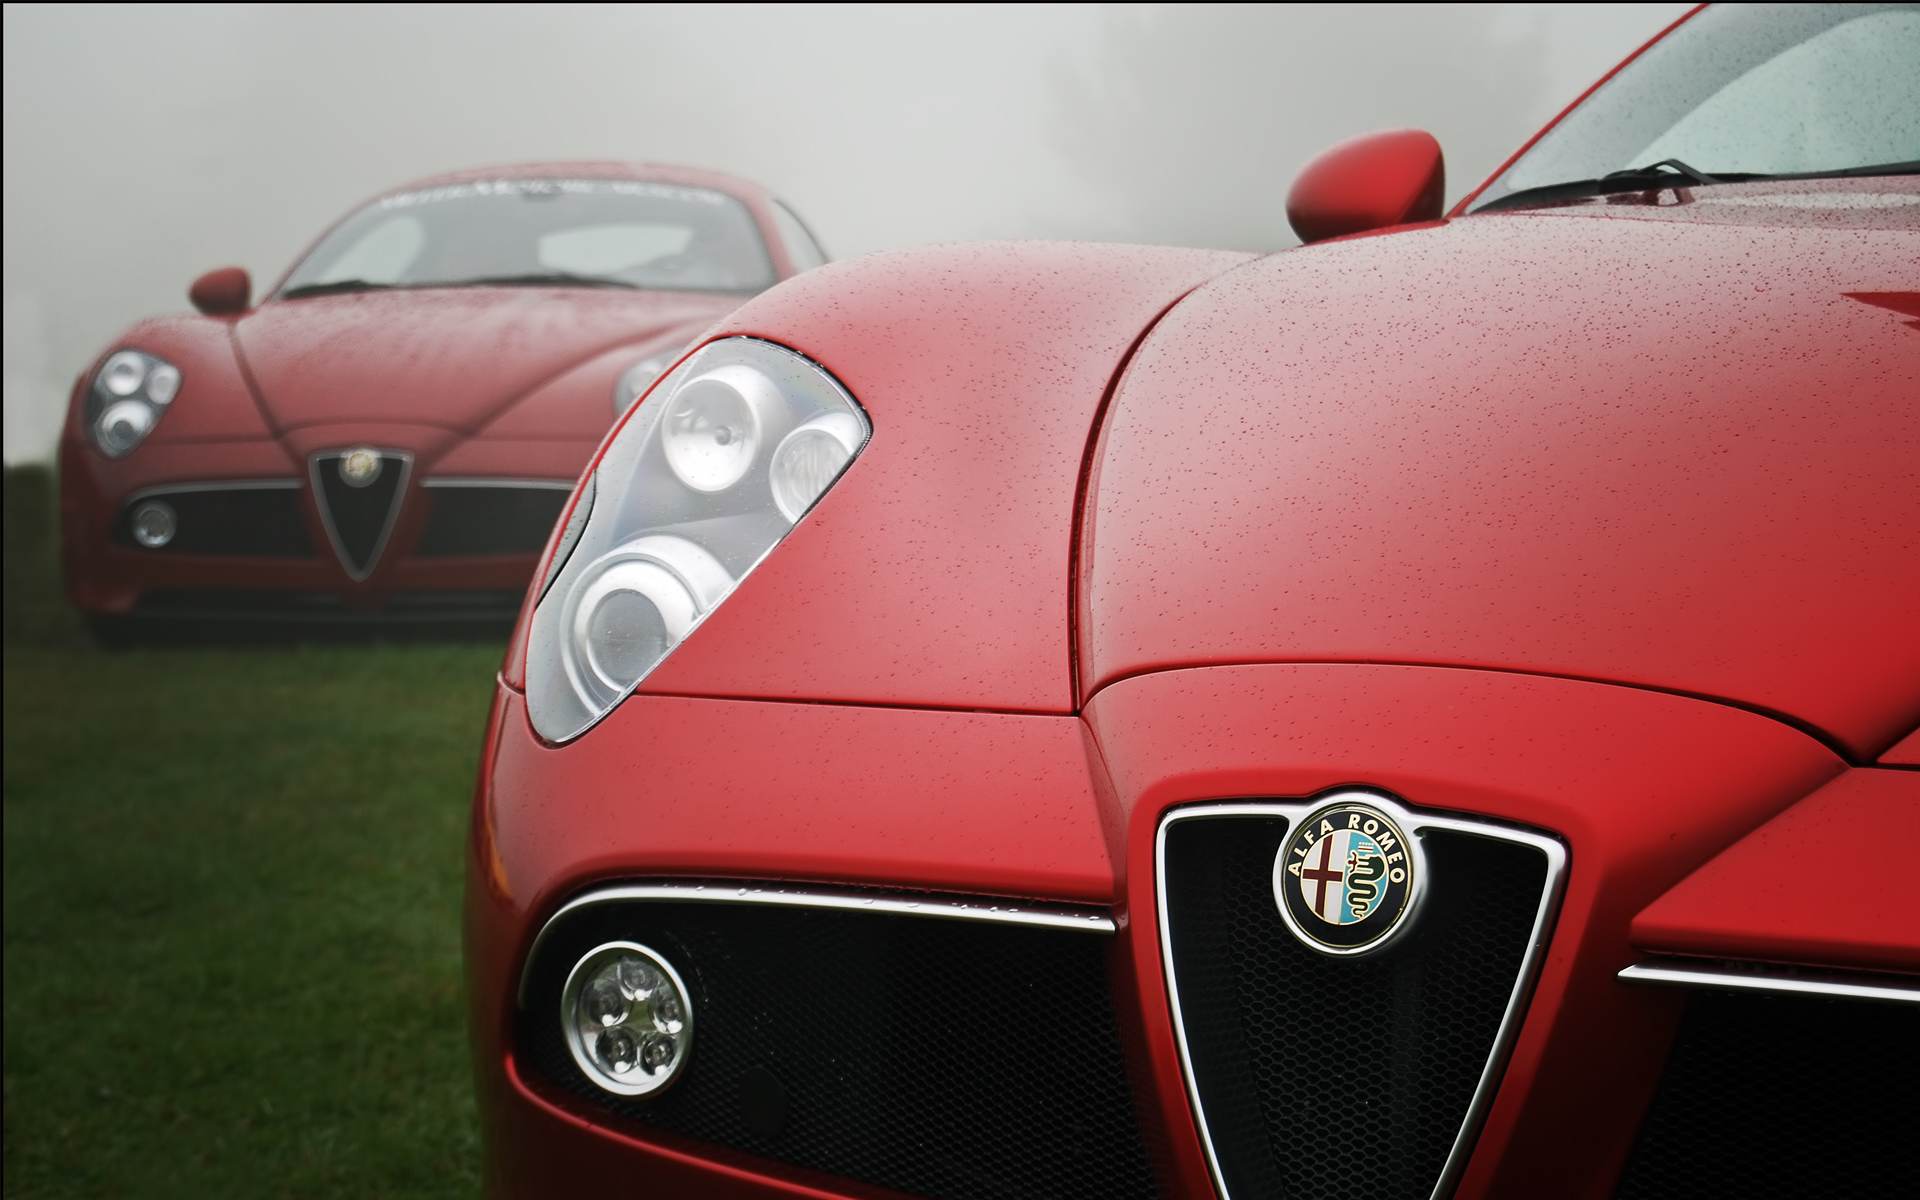 Alfa Romeo Бордовая  № 2426453 бесплатно